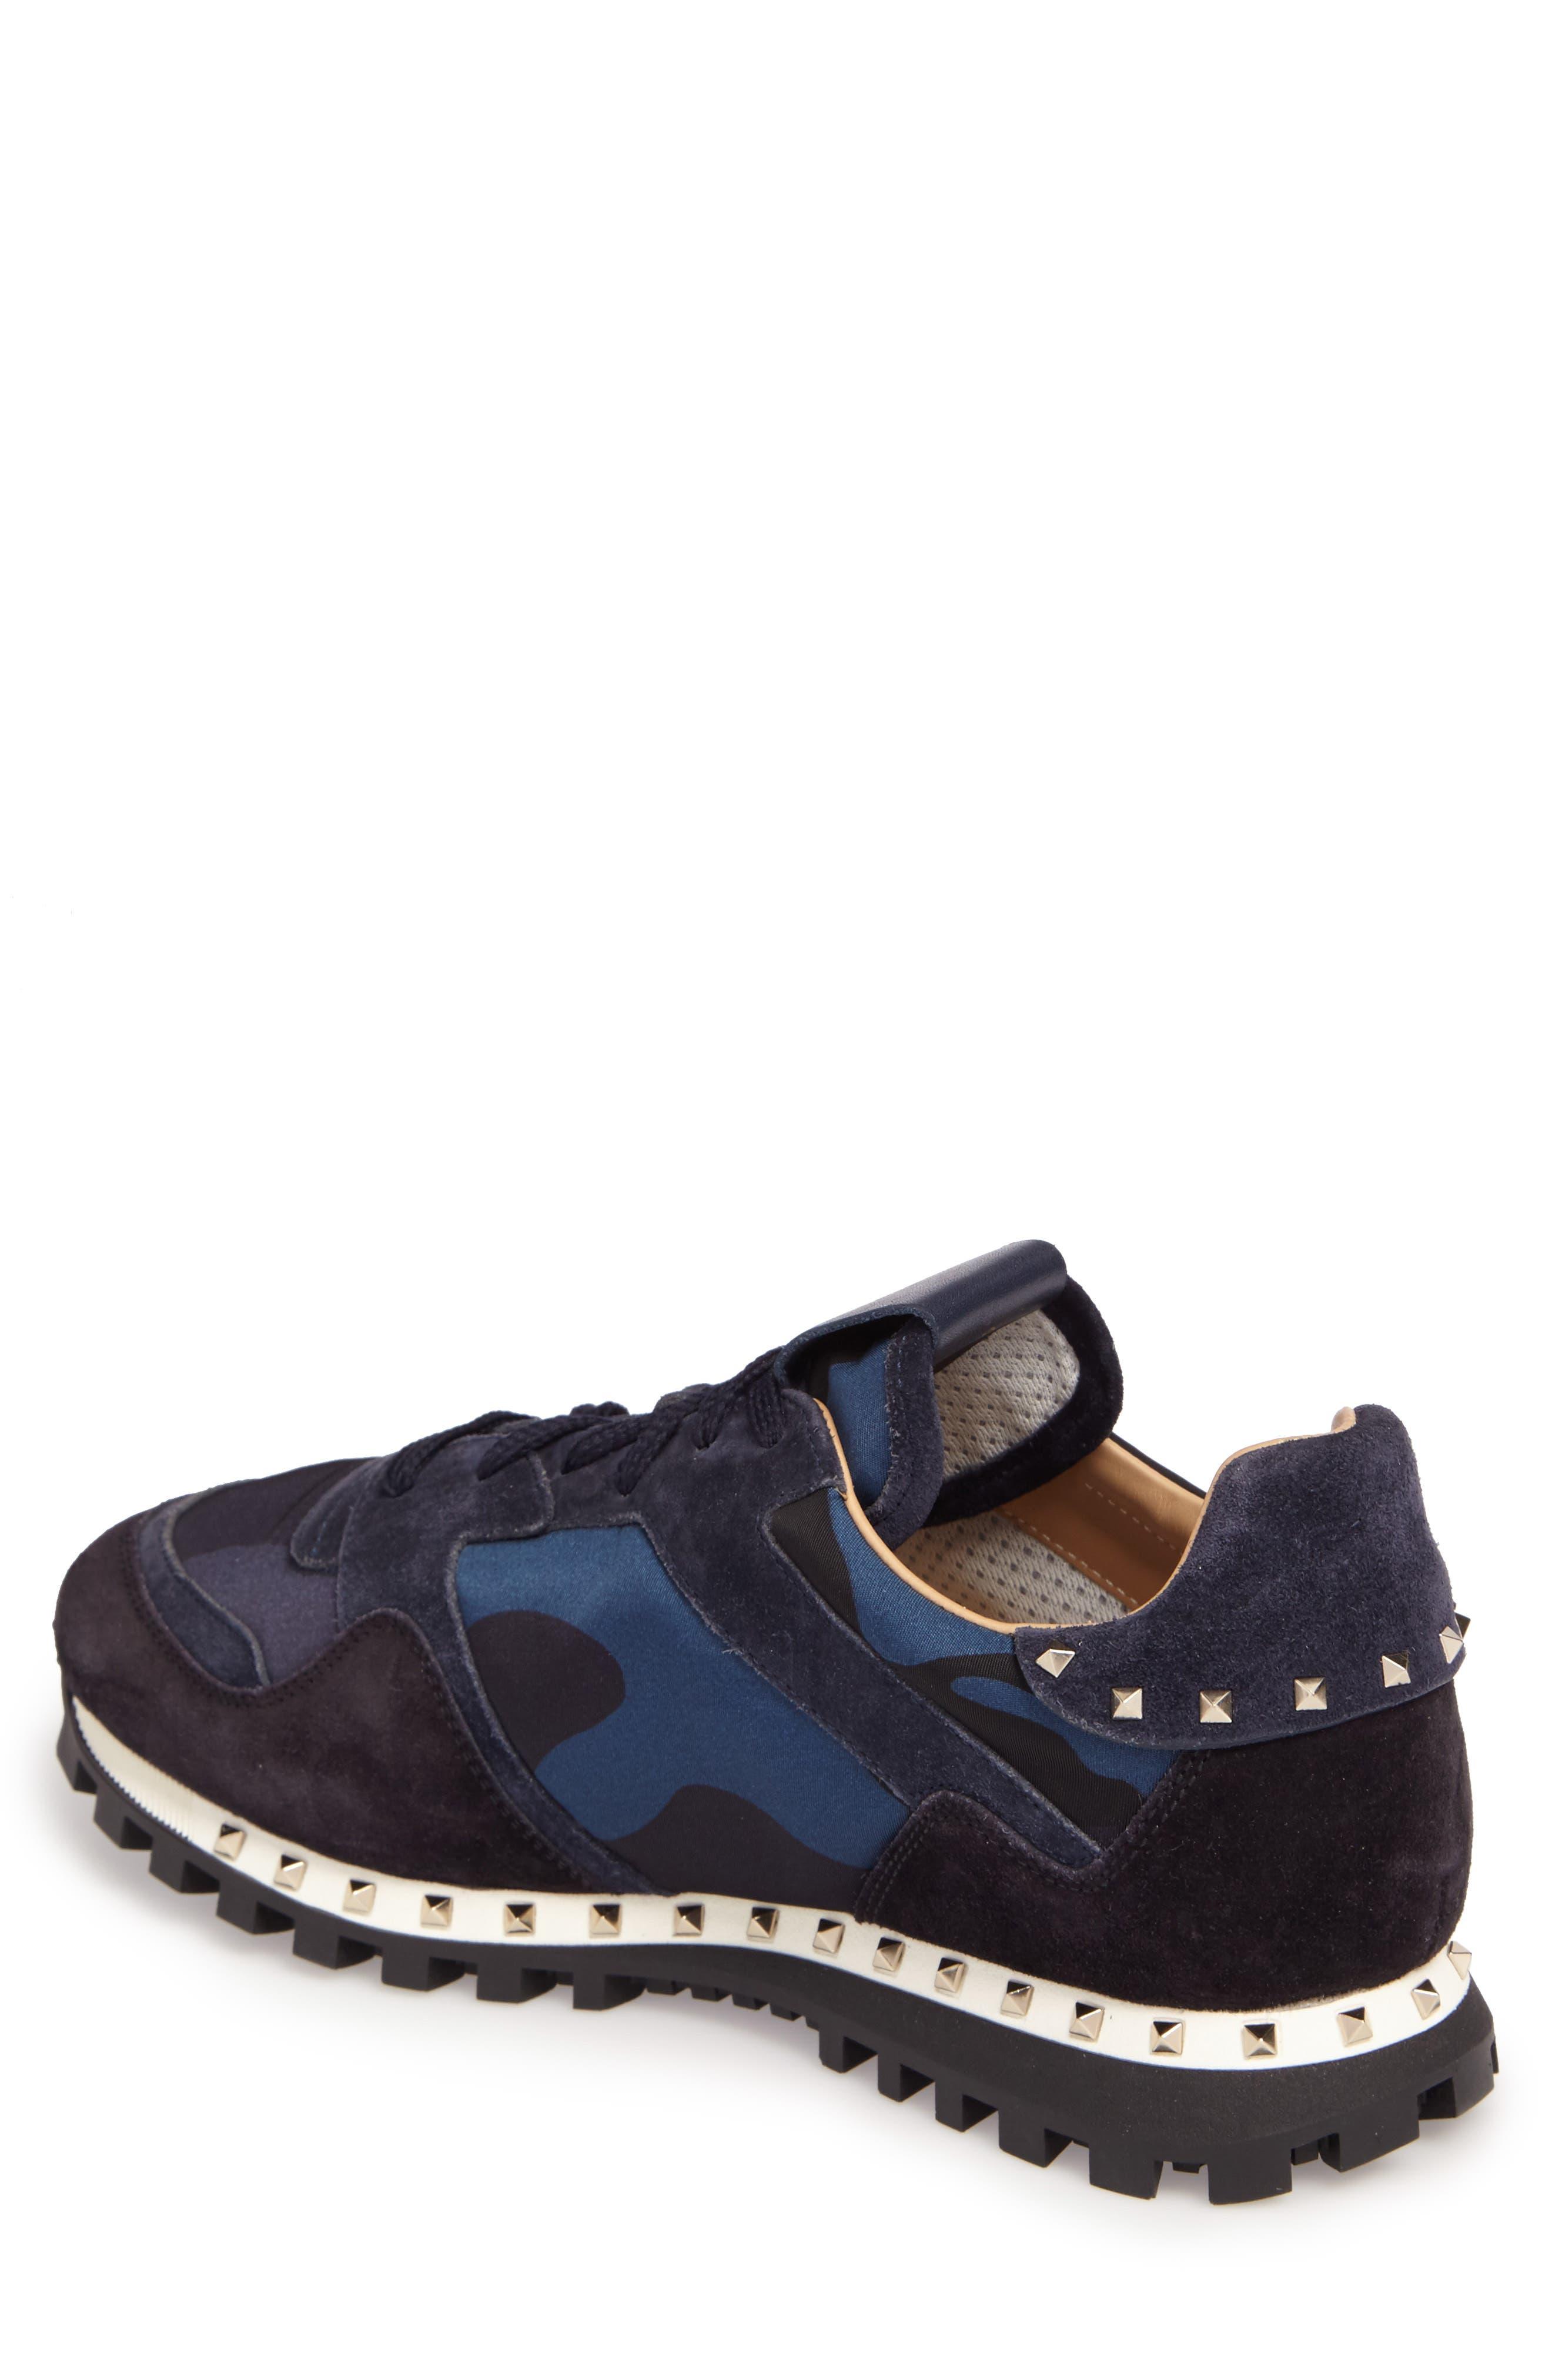 Camo Rockstud Sneaker,                             Alternate thumbnail 2, color,                             Marine/ Nero/ Dark Blue